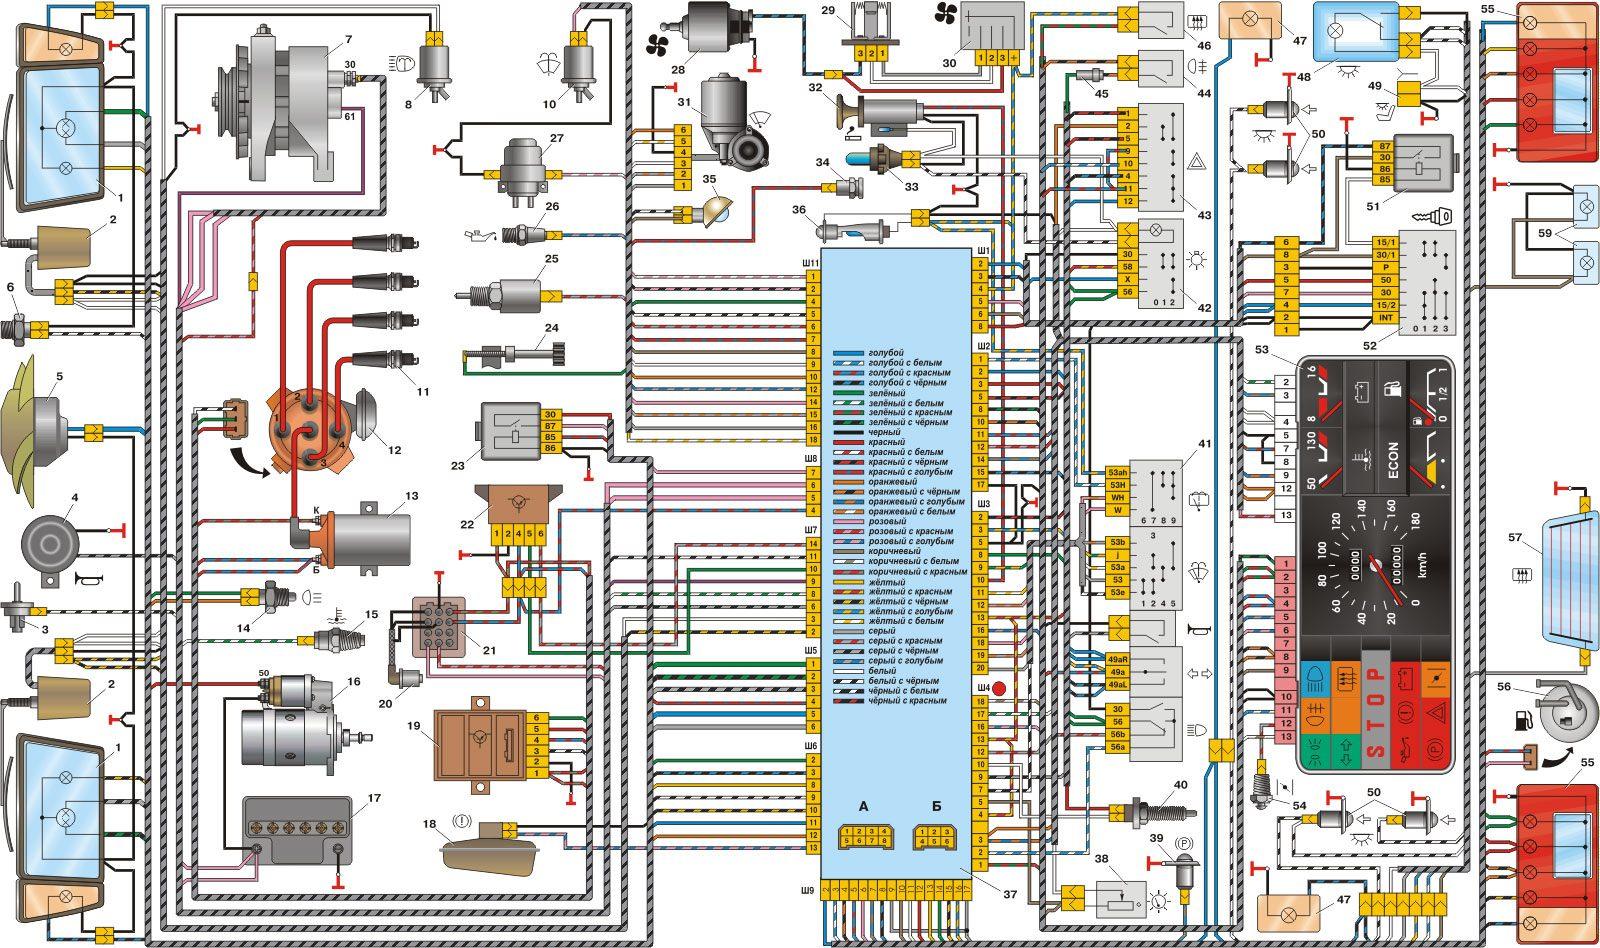 Схема электрооборудования автомобиля ВАЗ21093 ВАЗ21099